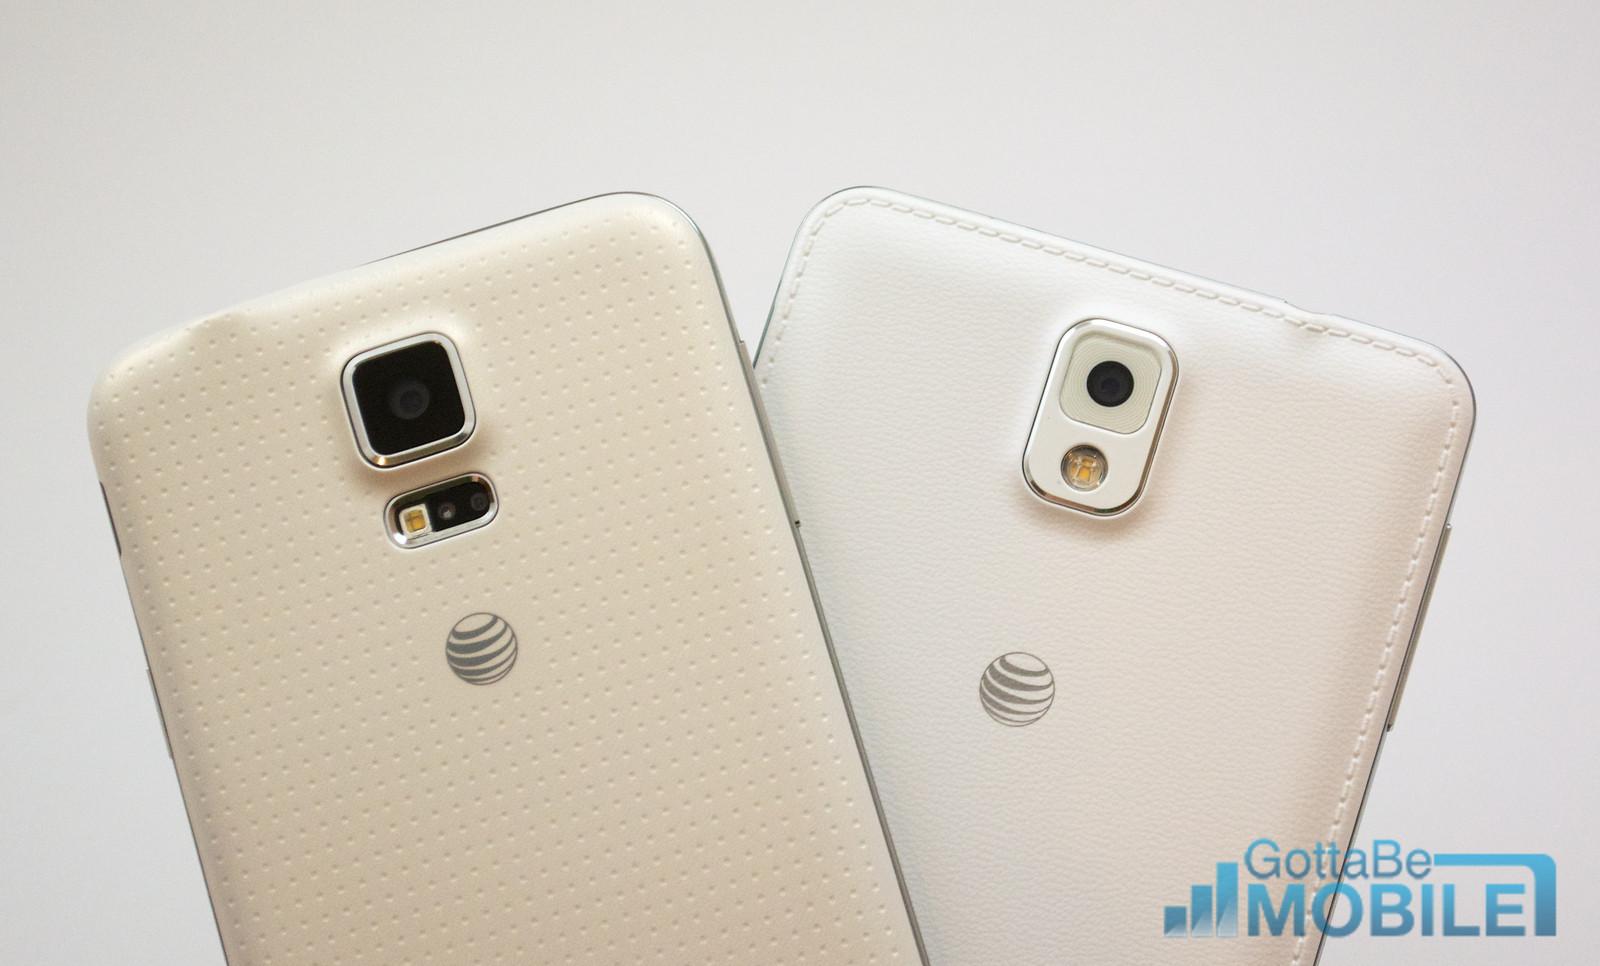 Galaxy Note 3 vs. Galaxy Note 4 Rumor Breakdown